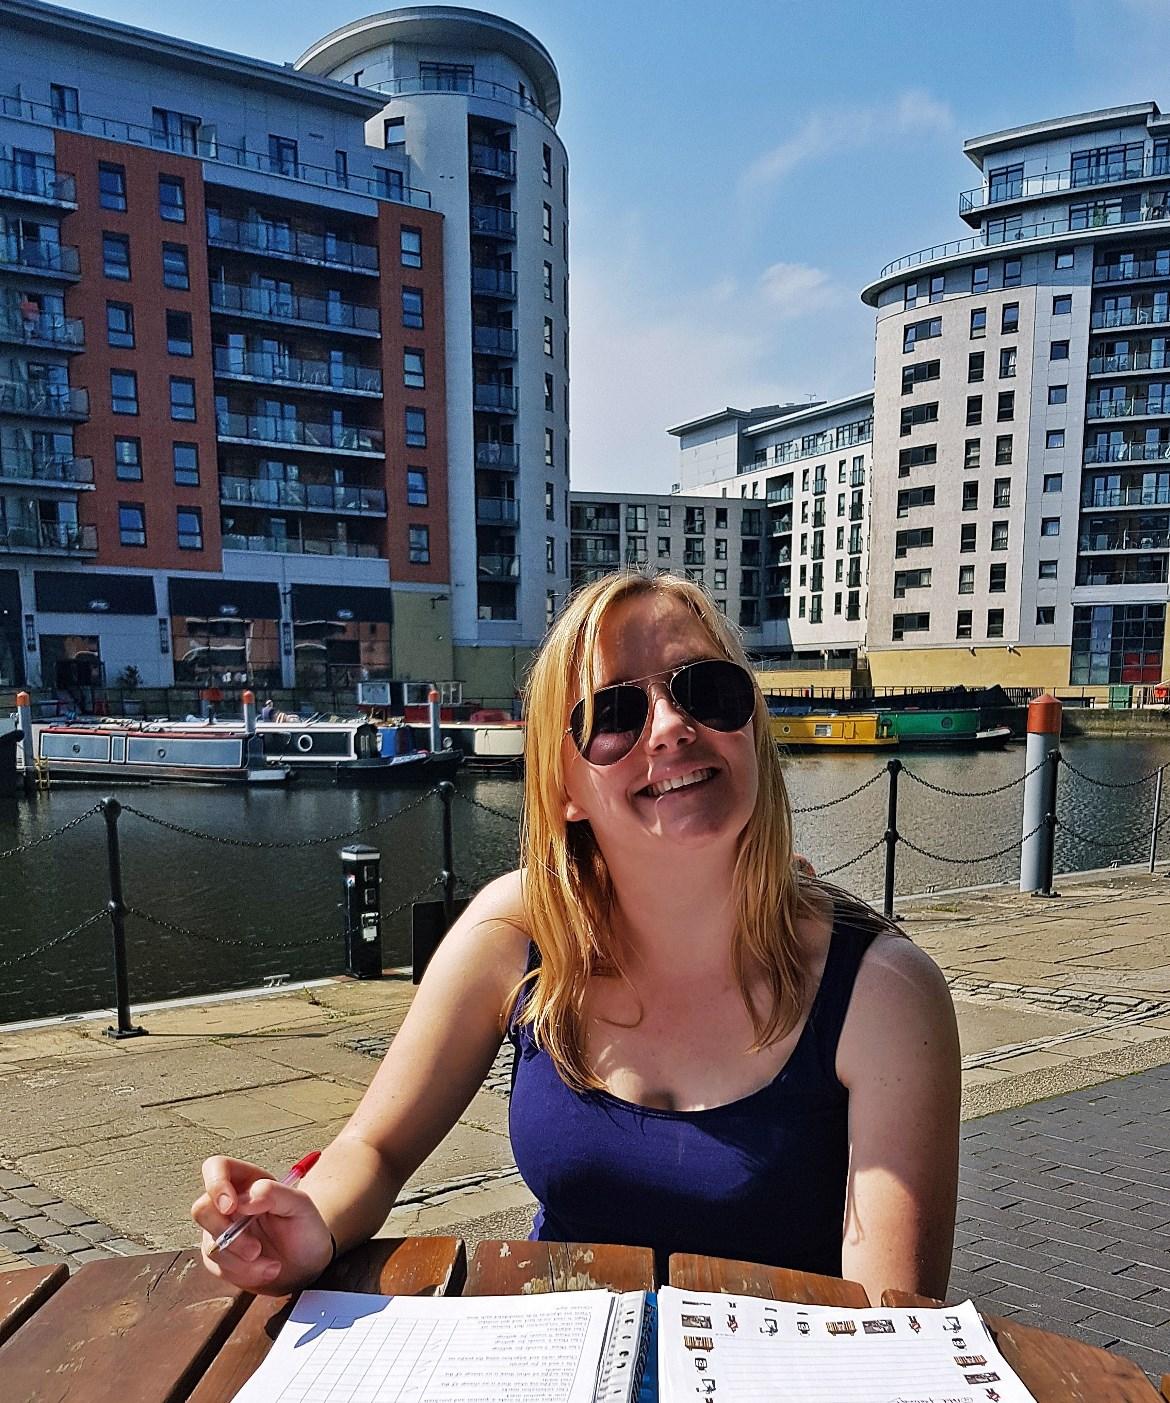 Enjoying the sun at Leeds Dock - May 2018 Monthly Recap by BeckyBecky Blogs